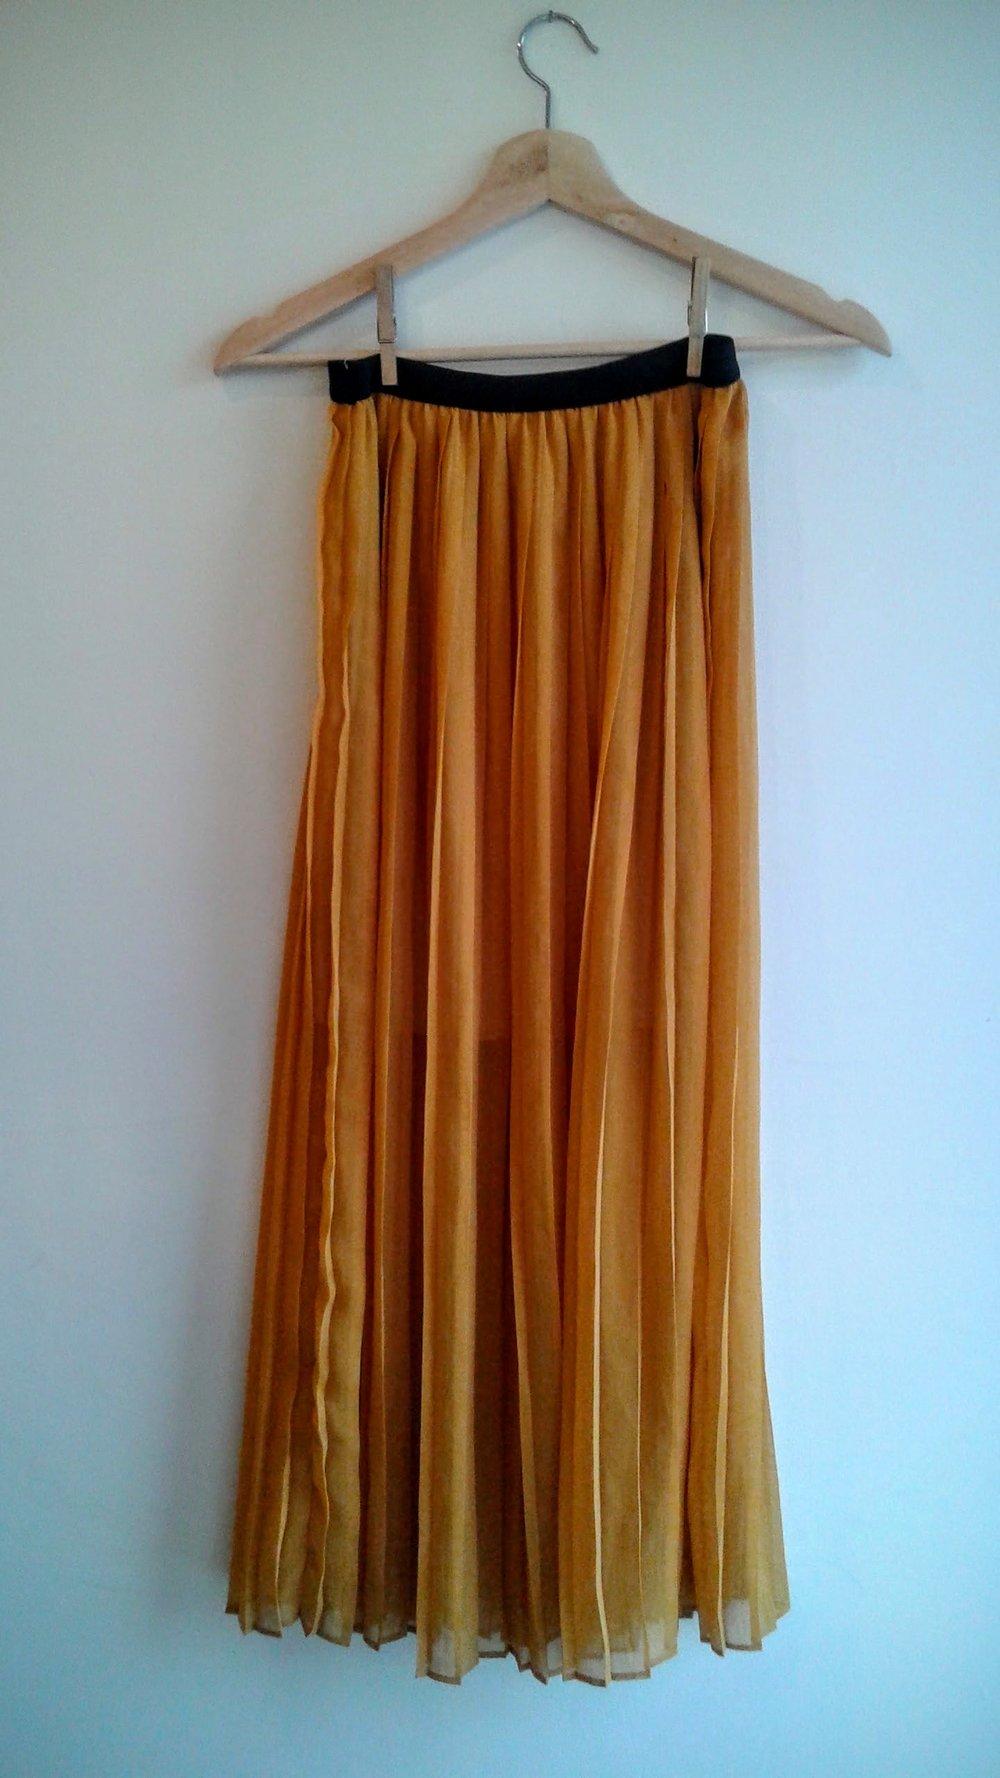 Loft 82 skirt; Size S, $42